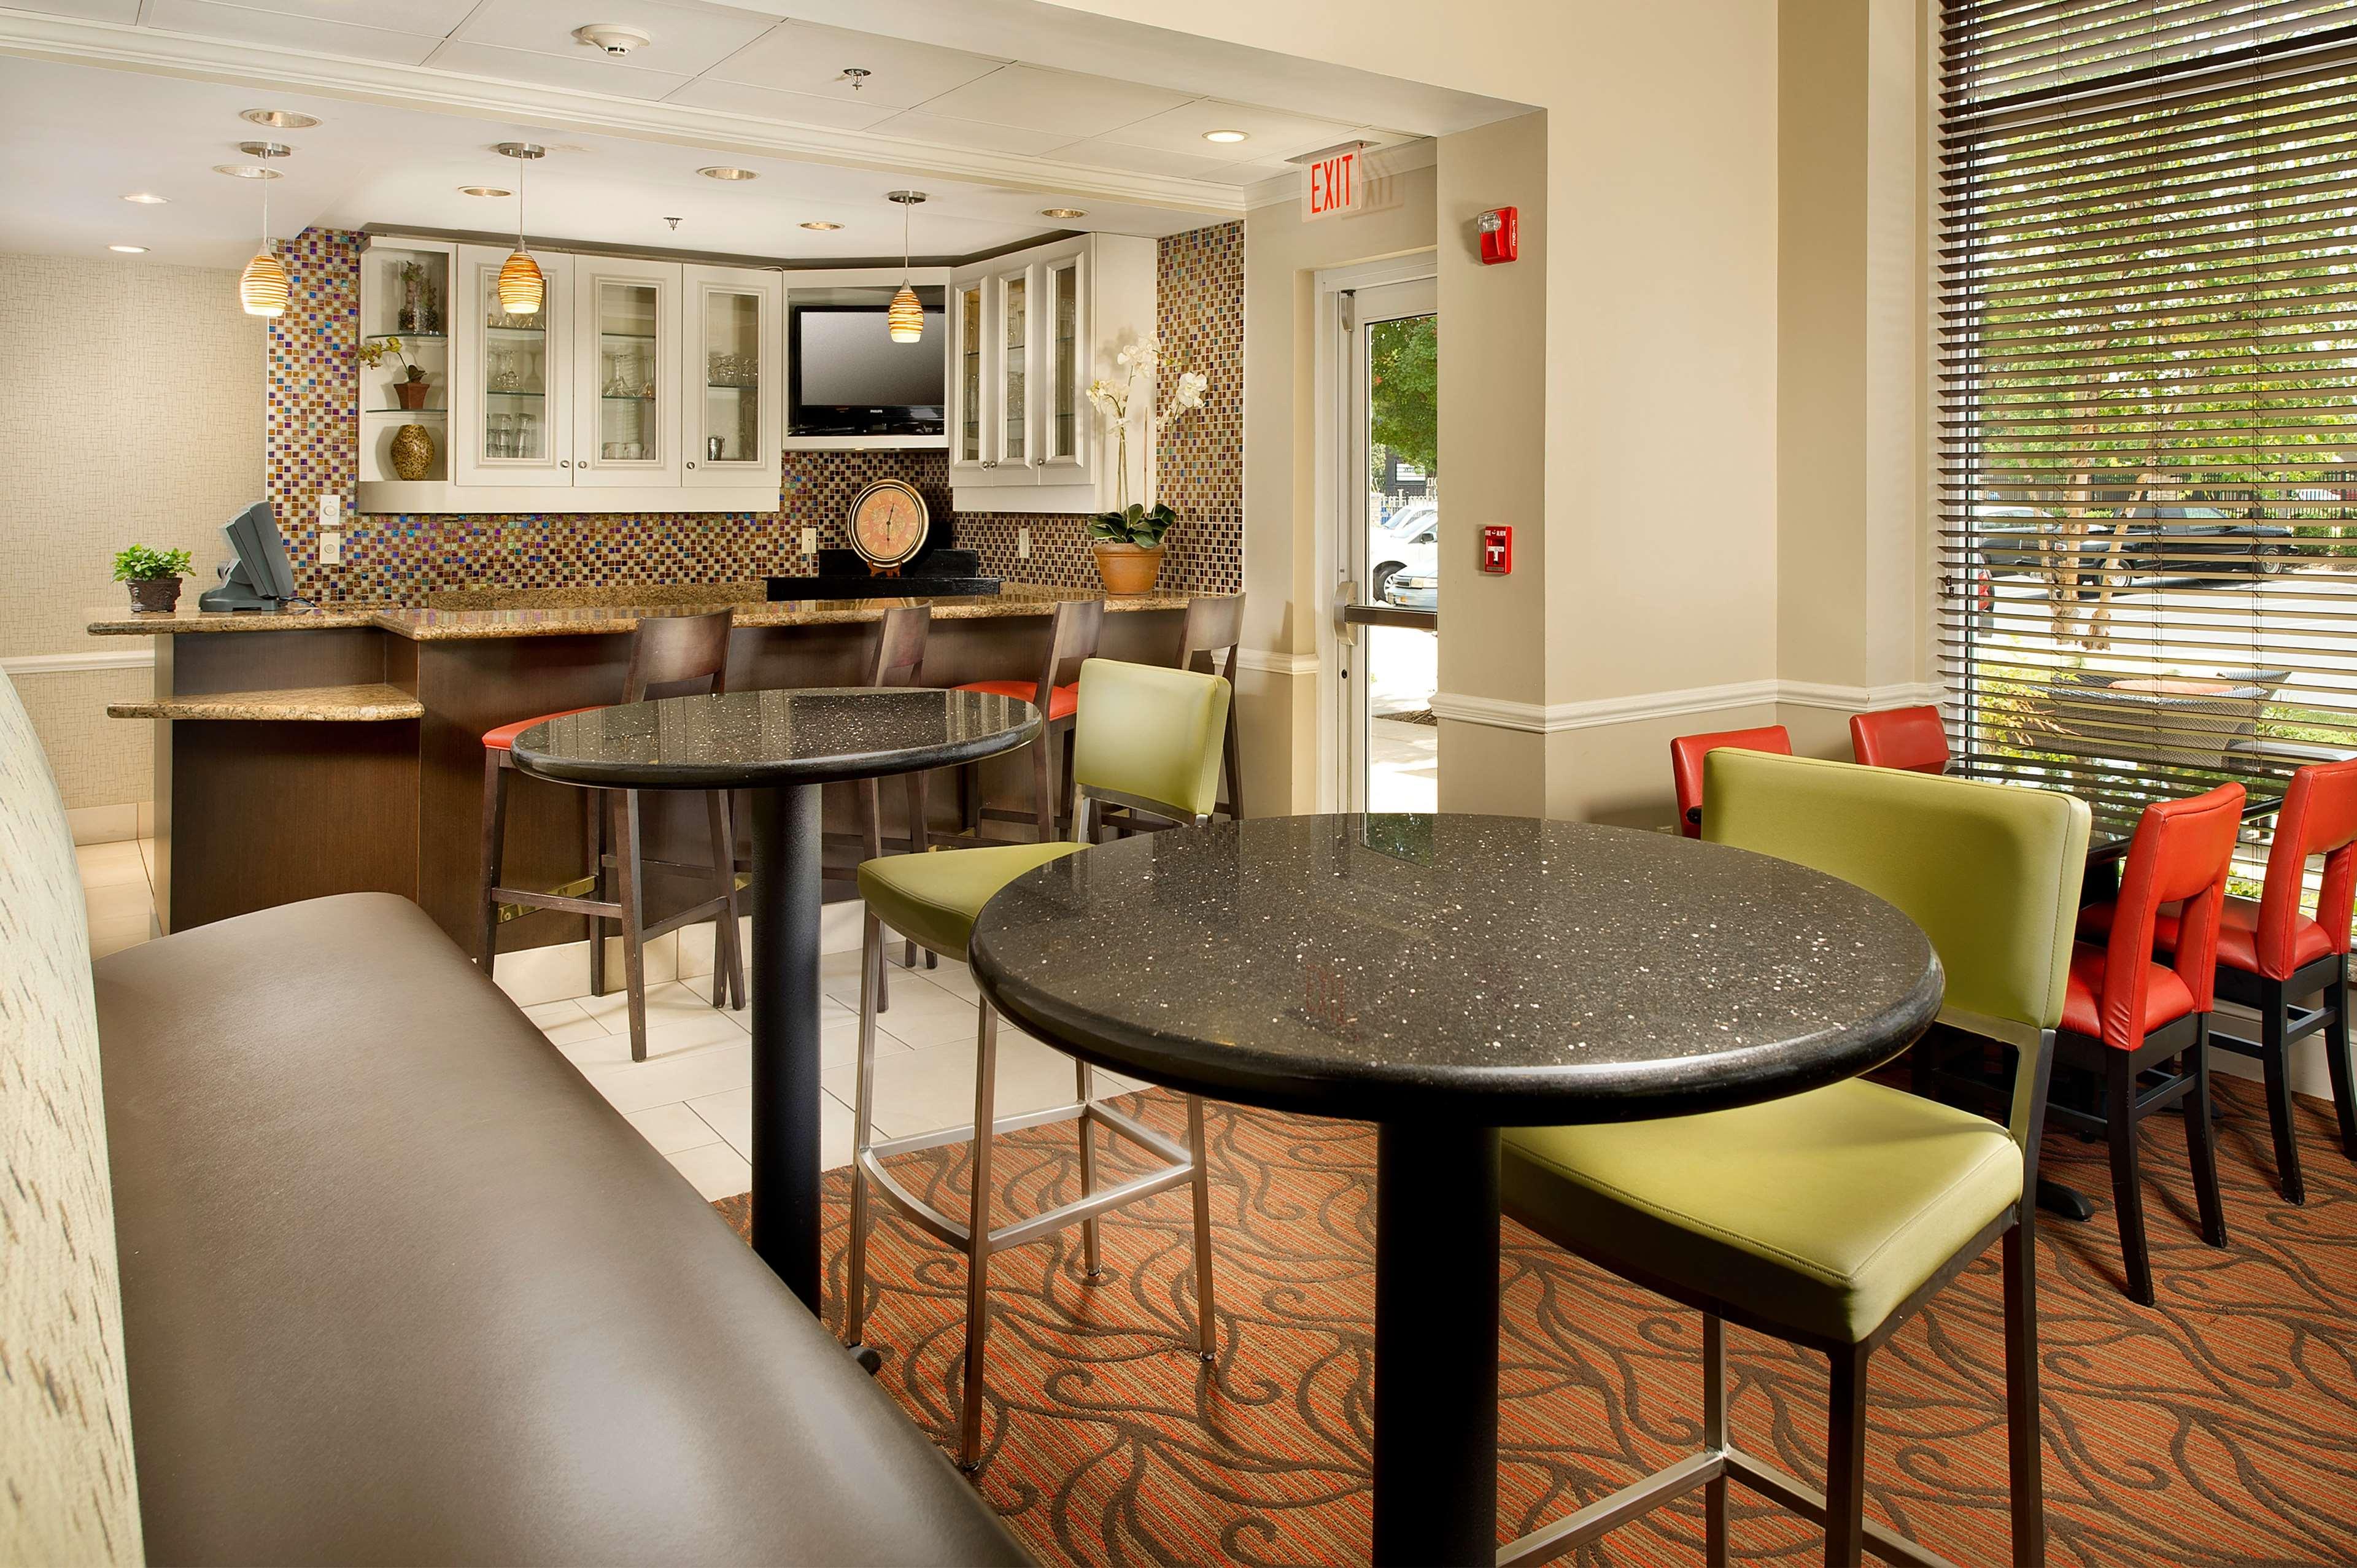 Hilton Garden Inn Chattanooga/Hamilton Place 2343 Shallowford ...